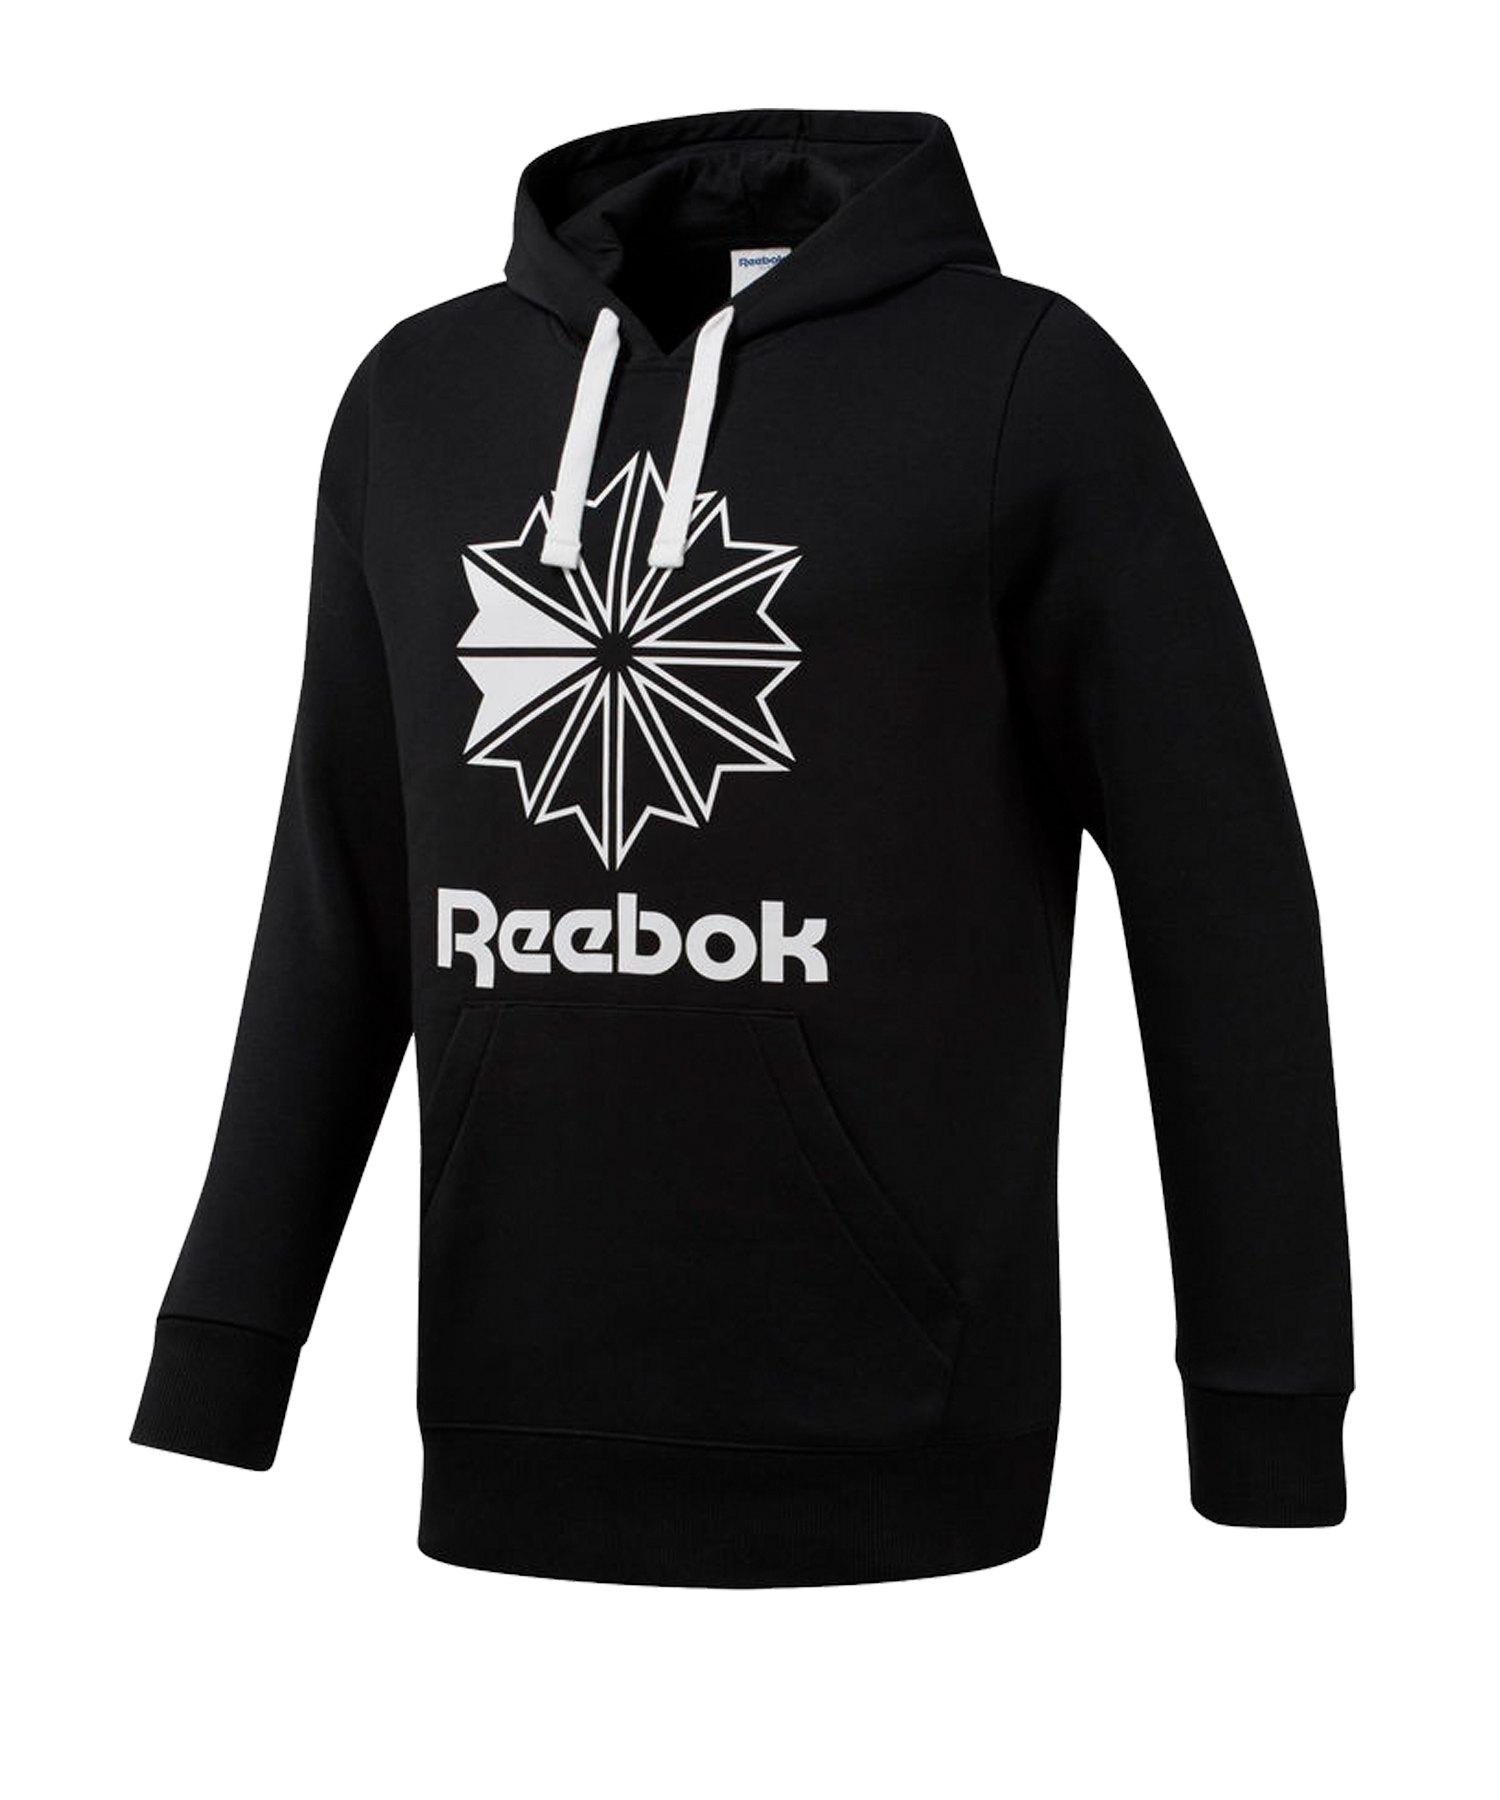 Reebok Classics Big Logo Kapuzensweatshirt Schwarz - schwarz